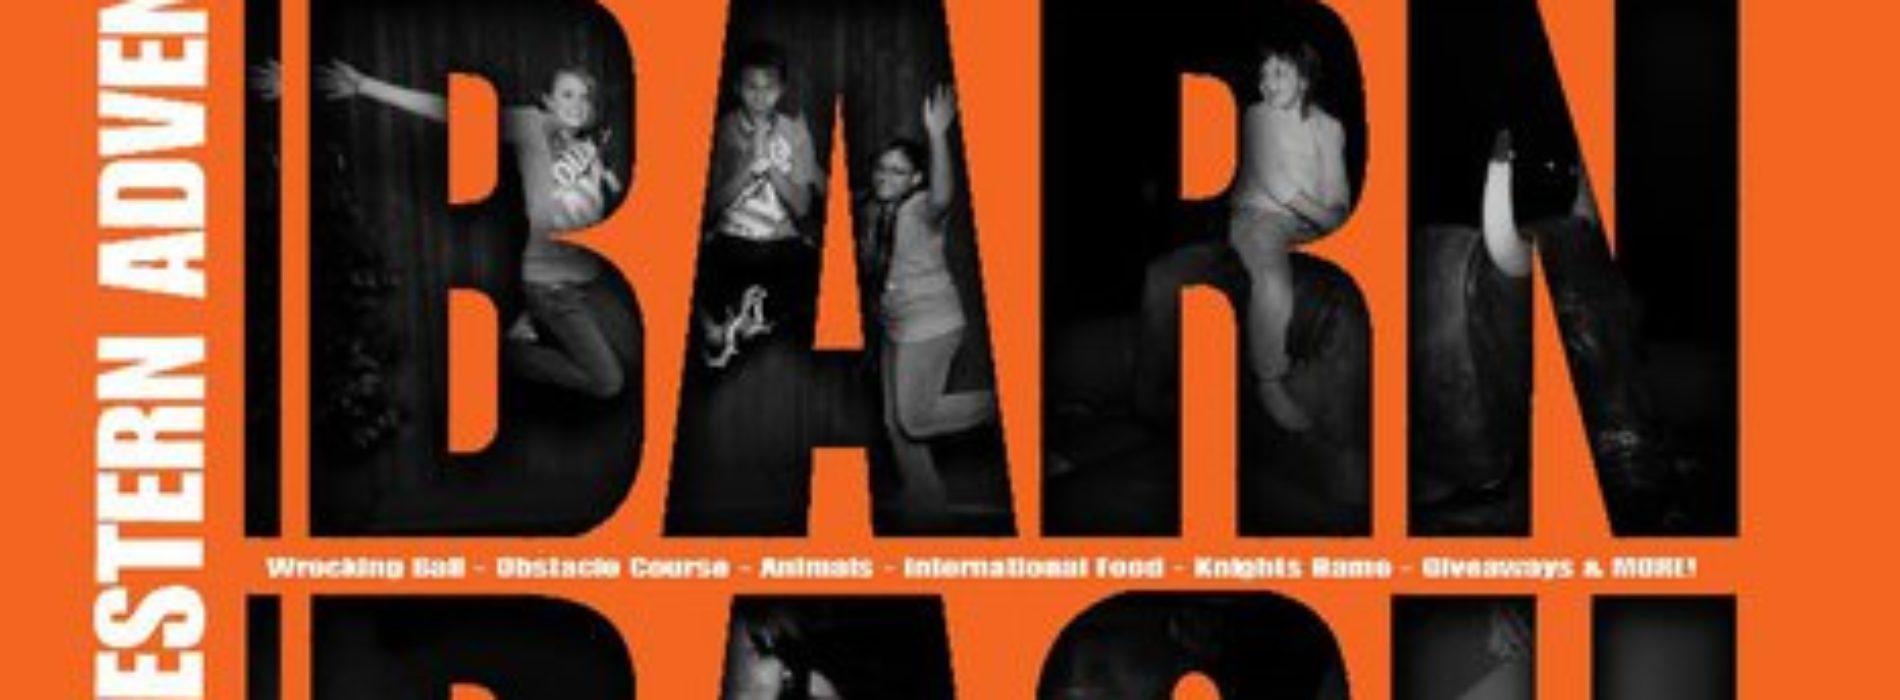 Barn Bash Slated for Oct. 9